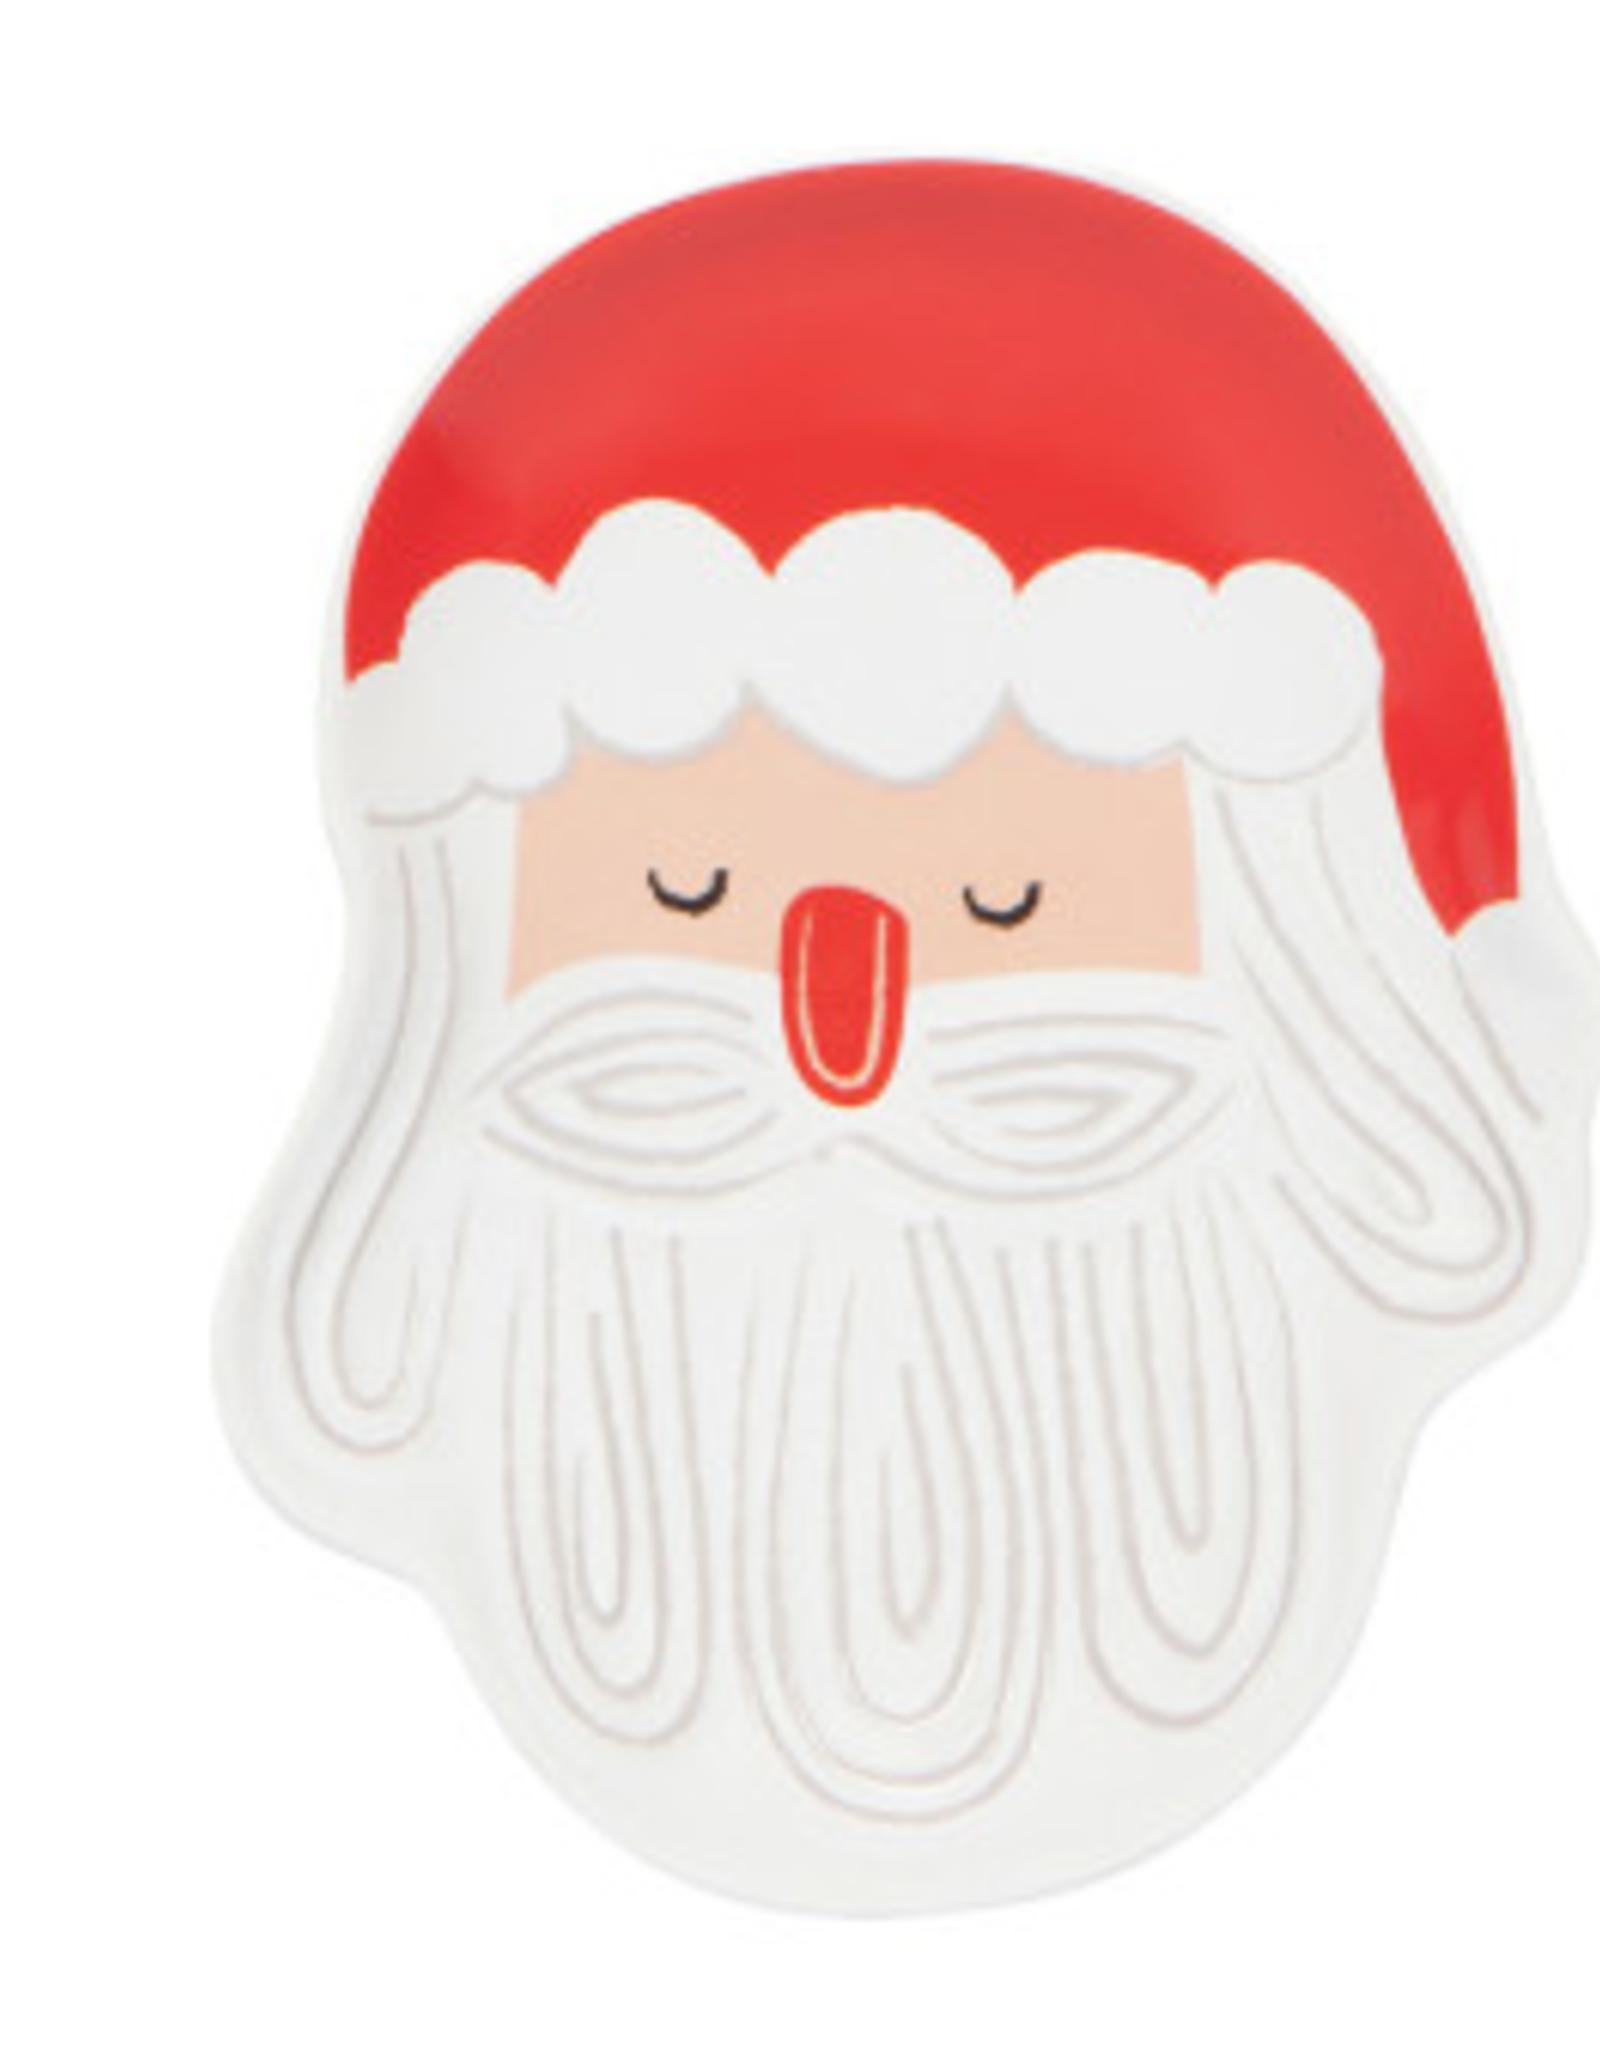 Danica Danica Must Be Santa Shaped Dish-Set 3